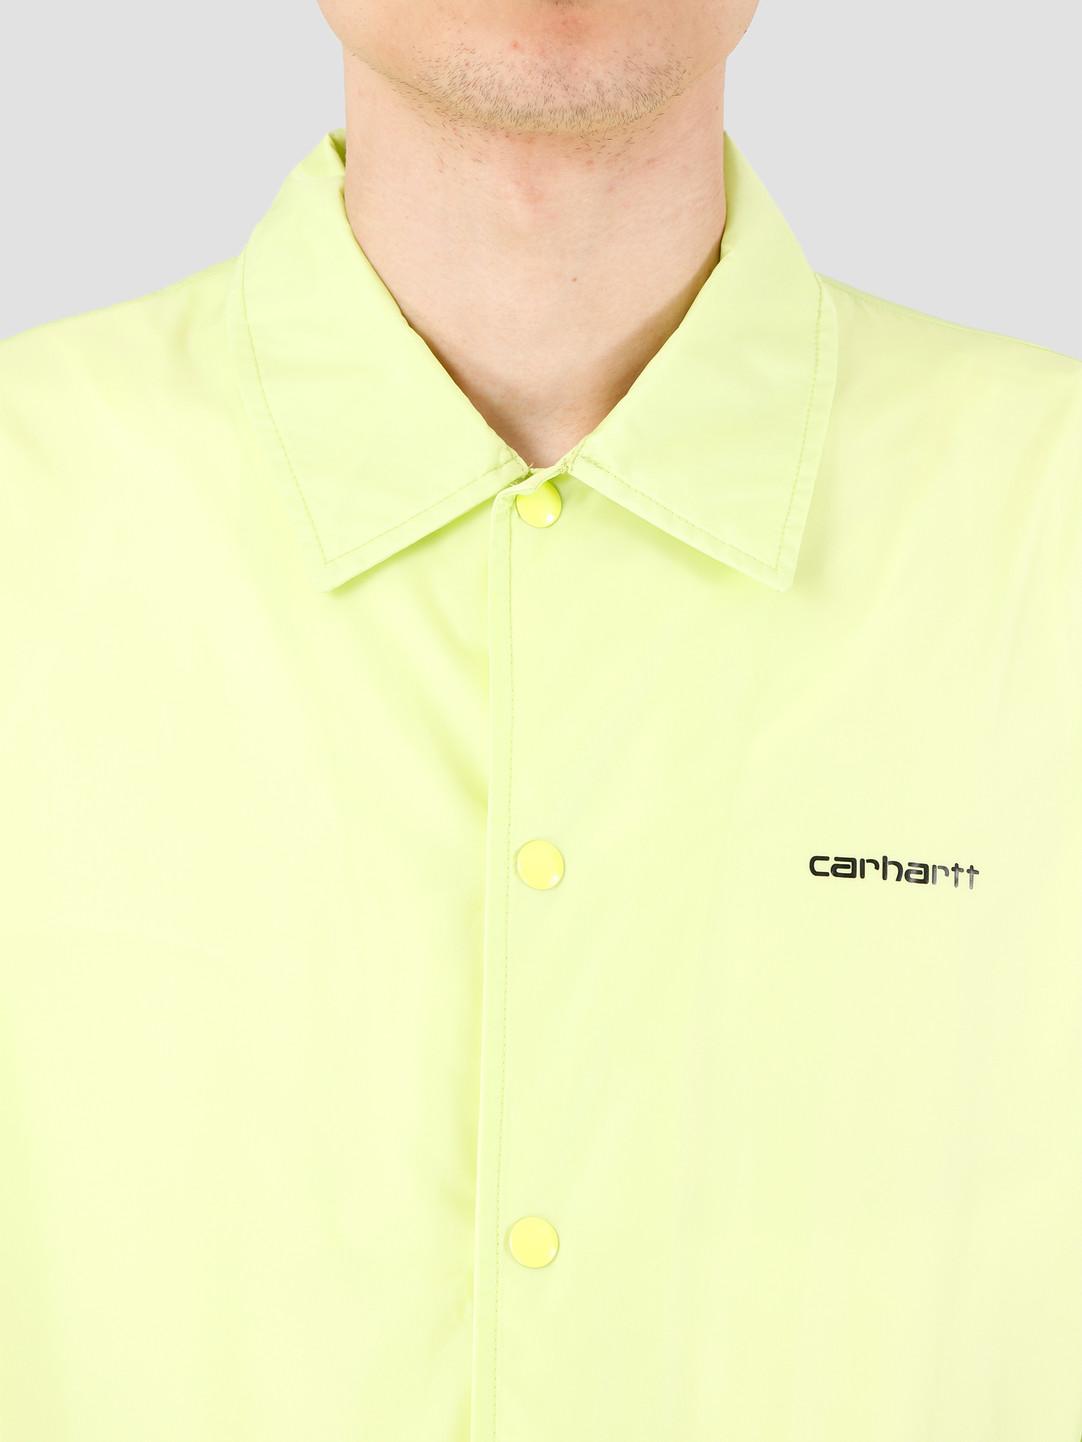 Carhartt WIP Carhartt WIP Carhartt Script Coach Jacket Lime Black I027784-09E00